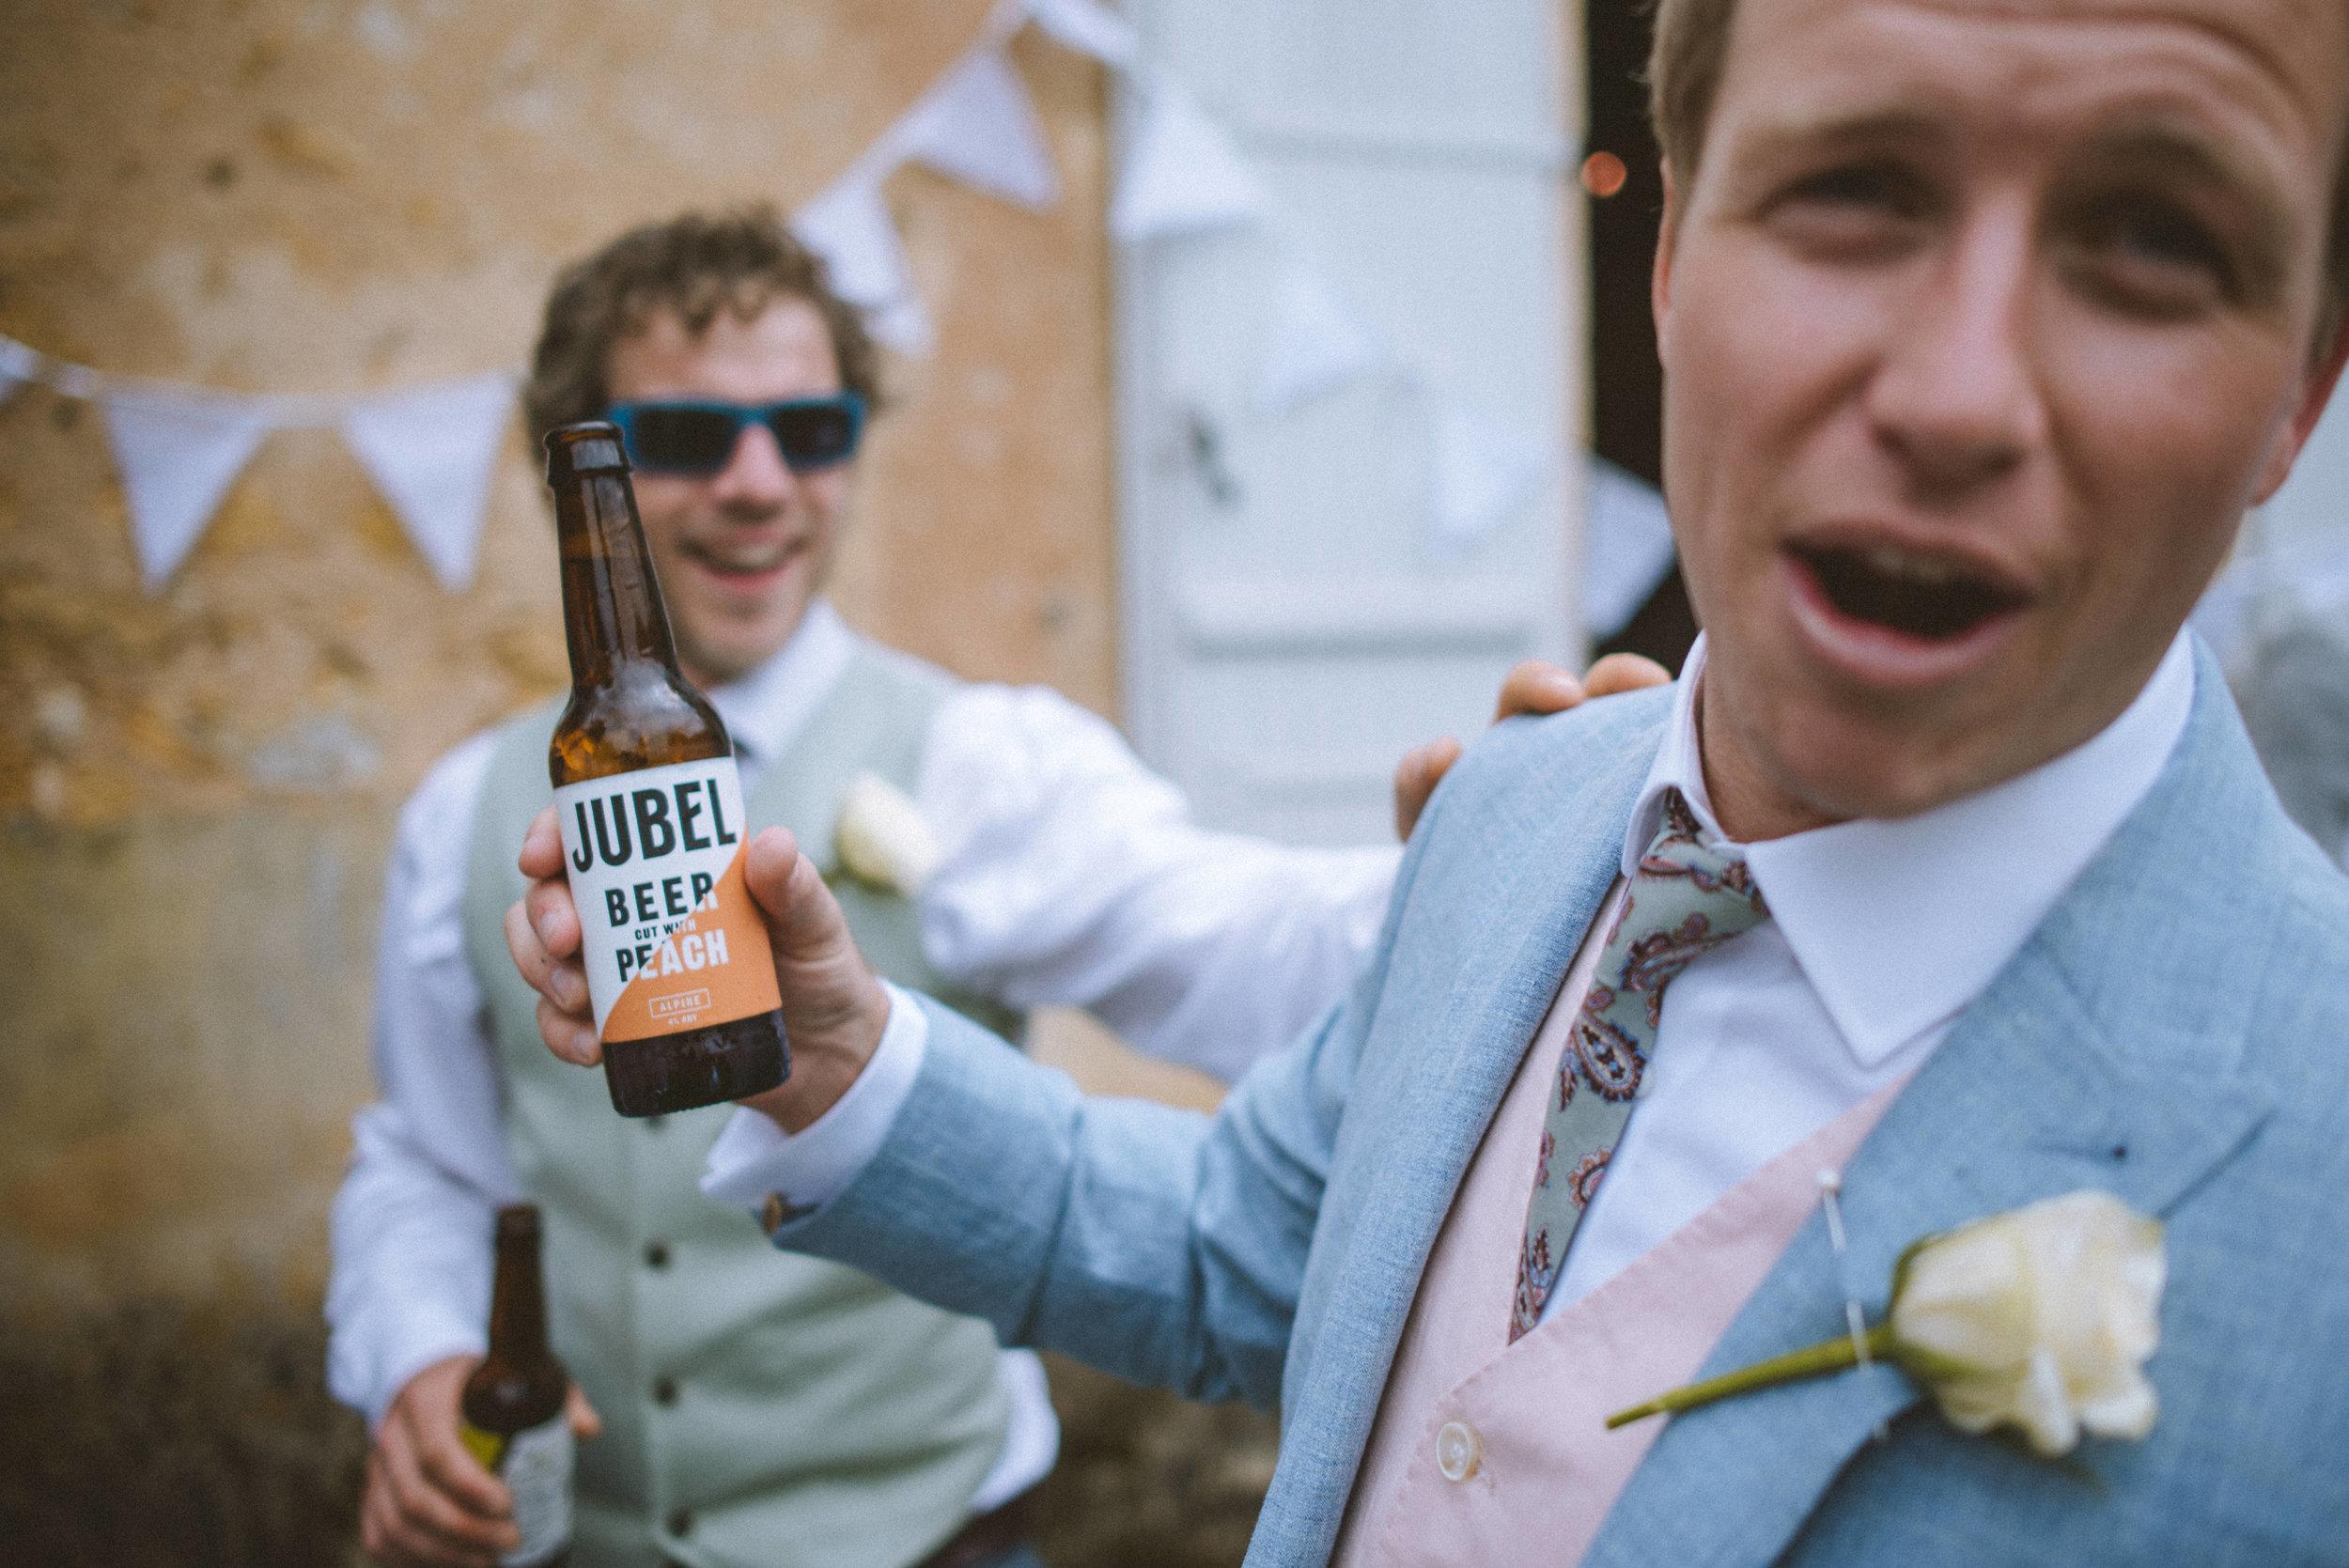 wedding-photographer-dordogne-mark-shaw-24.jpg